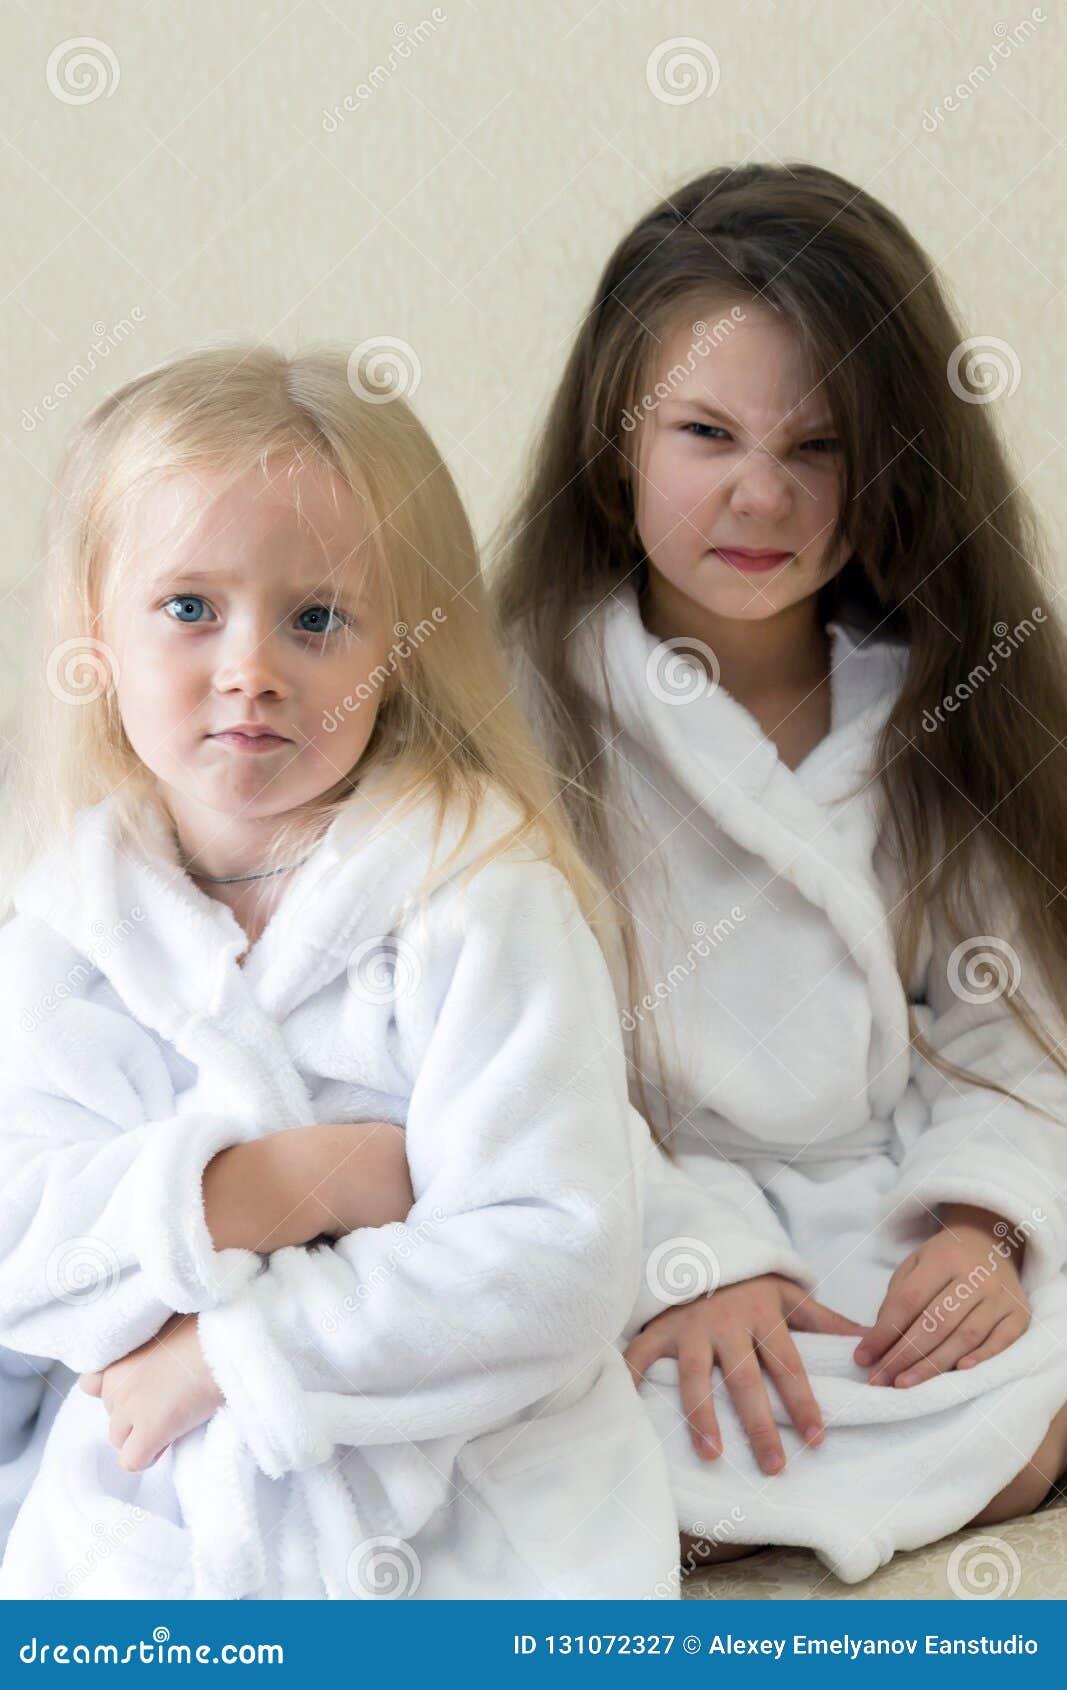 The girls quarreled quarreled among themselves.